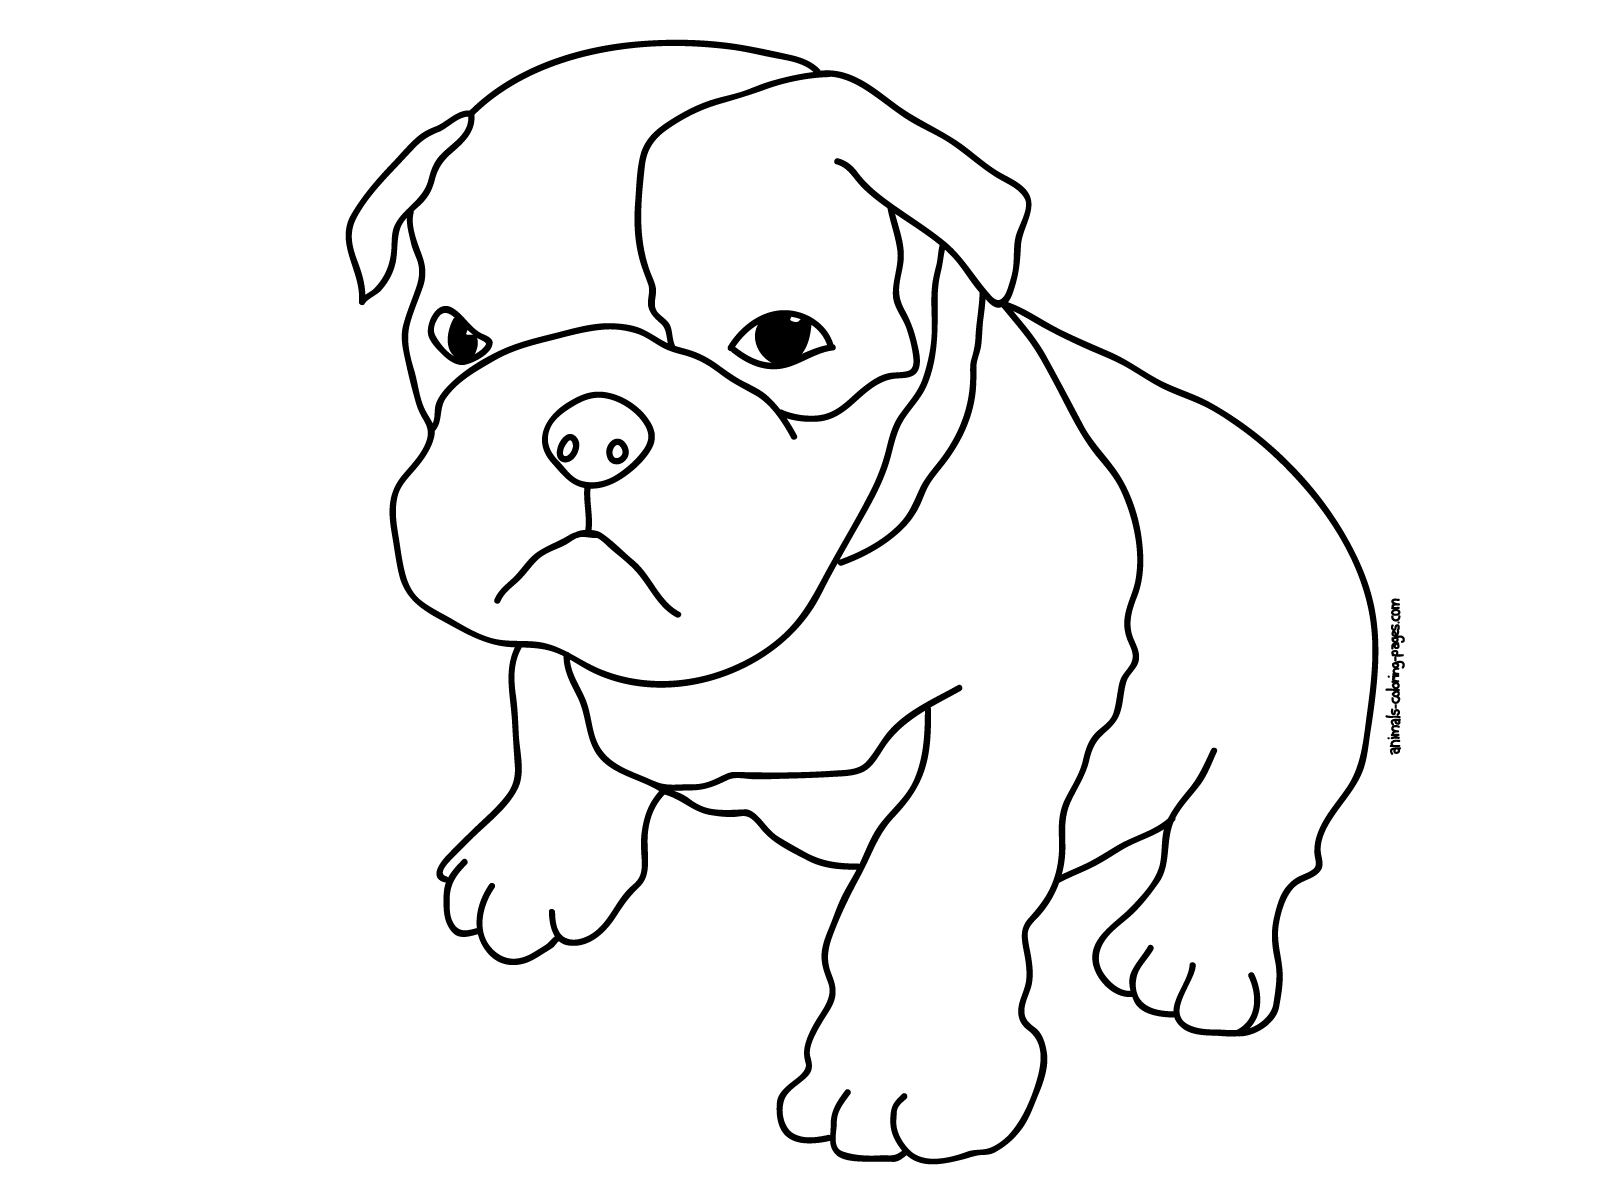 Dibujo de Perro para recortar e imprimir - Dibujos De